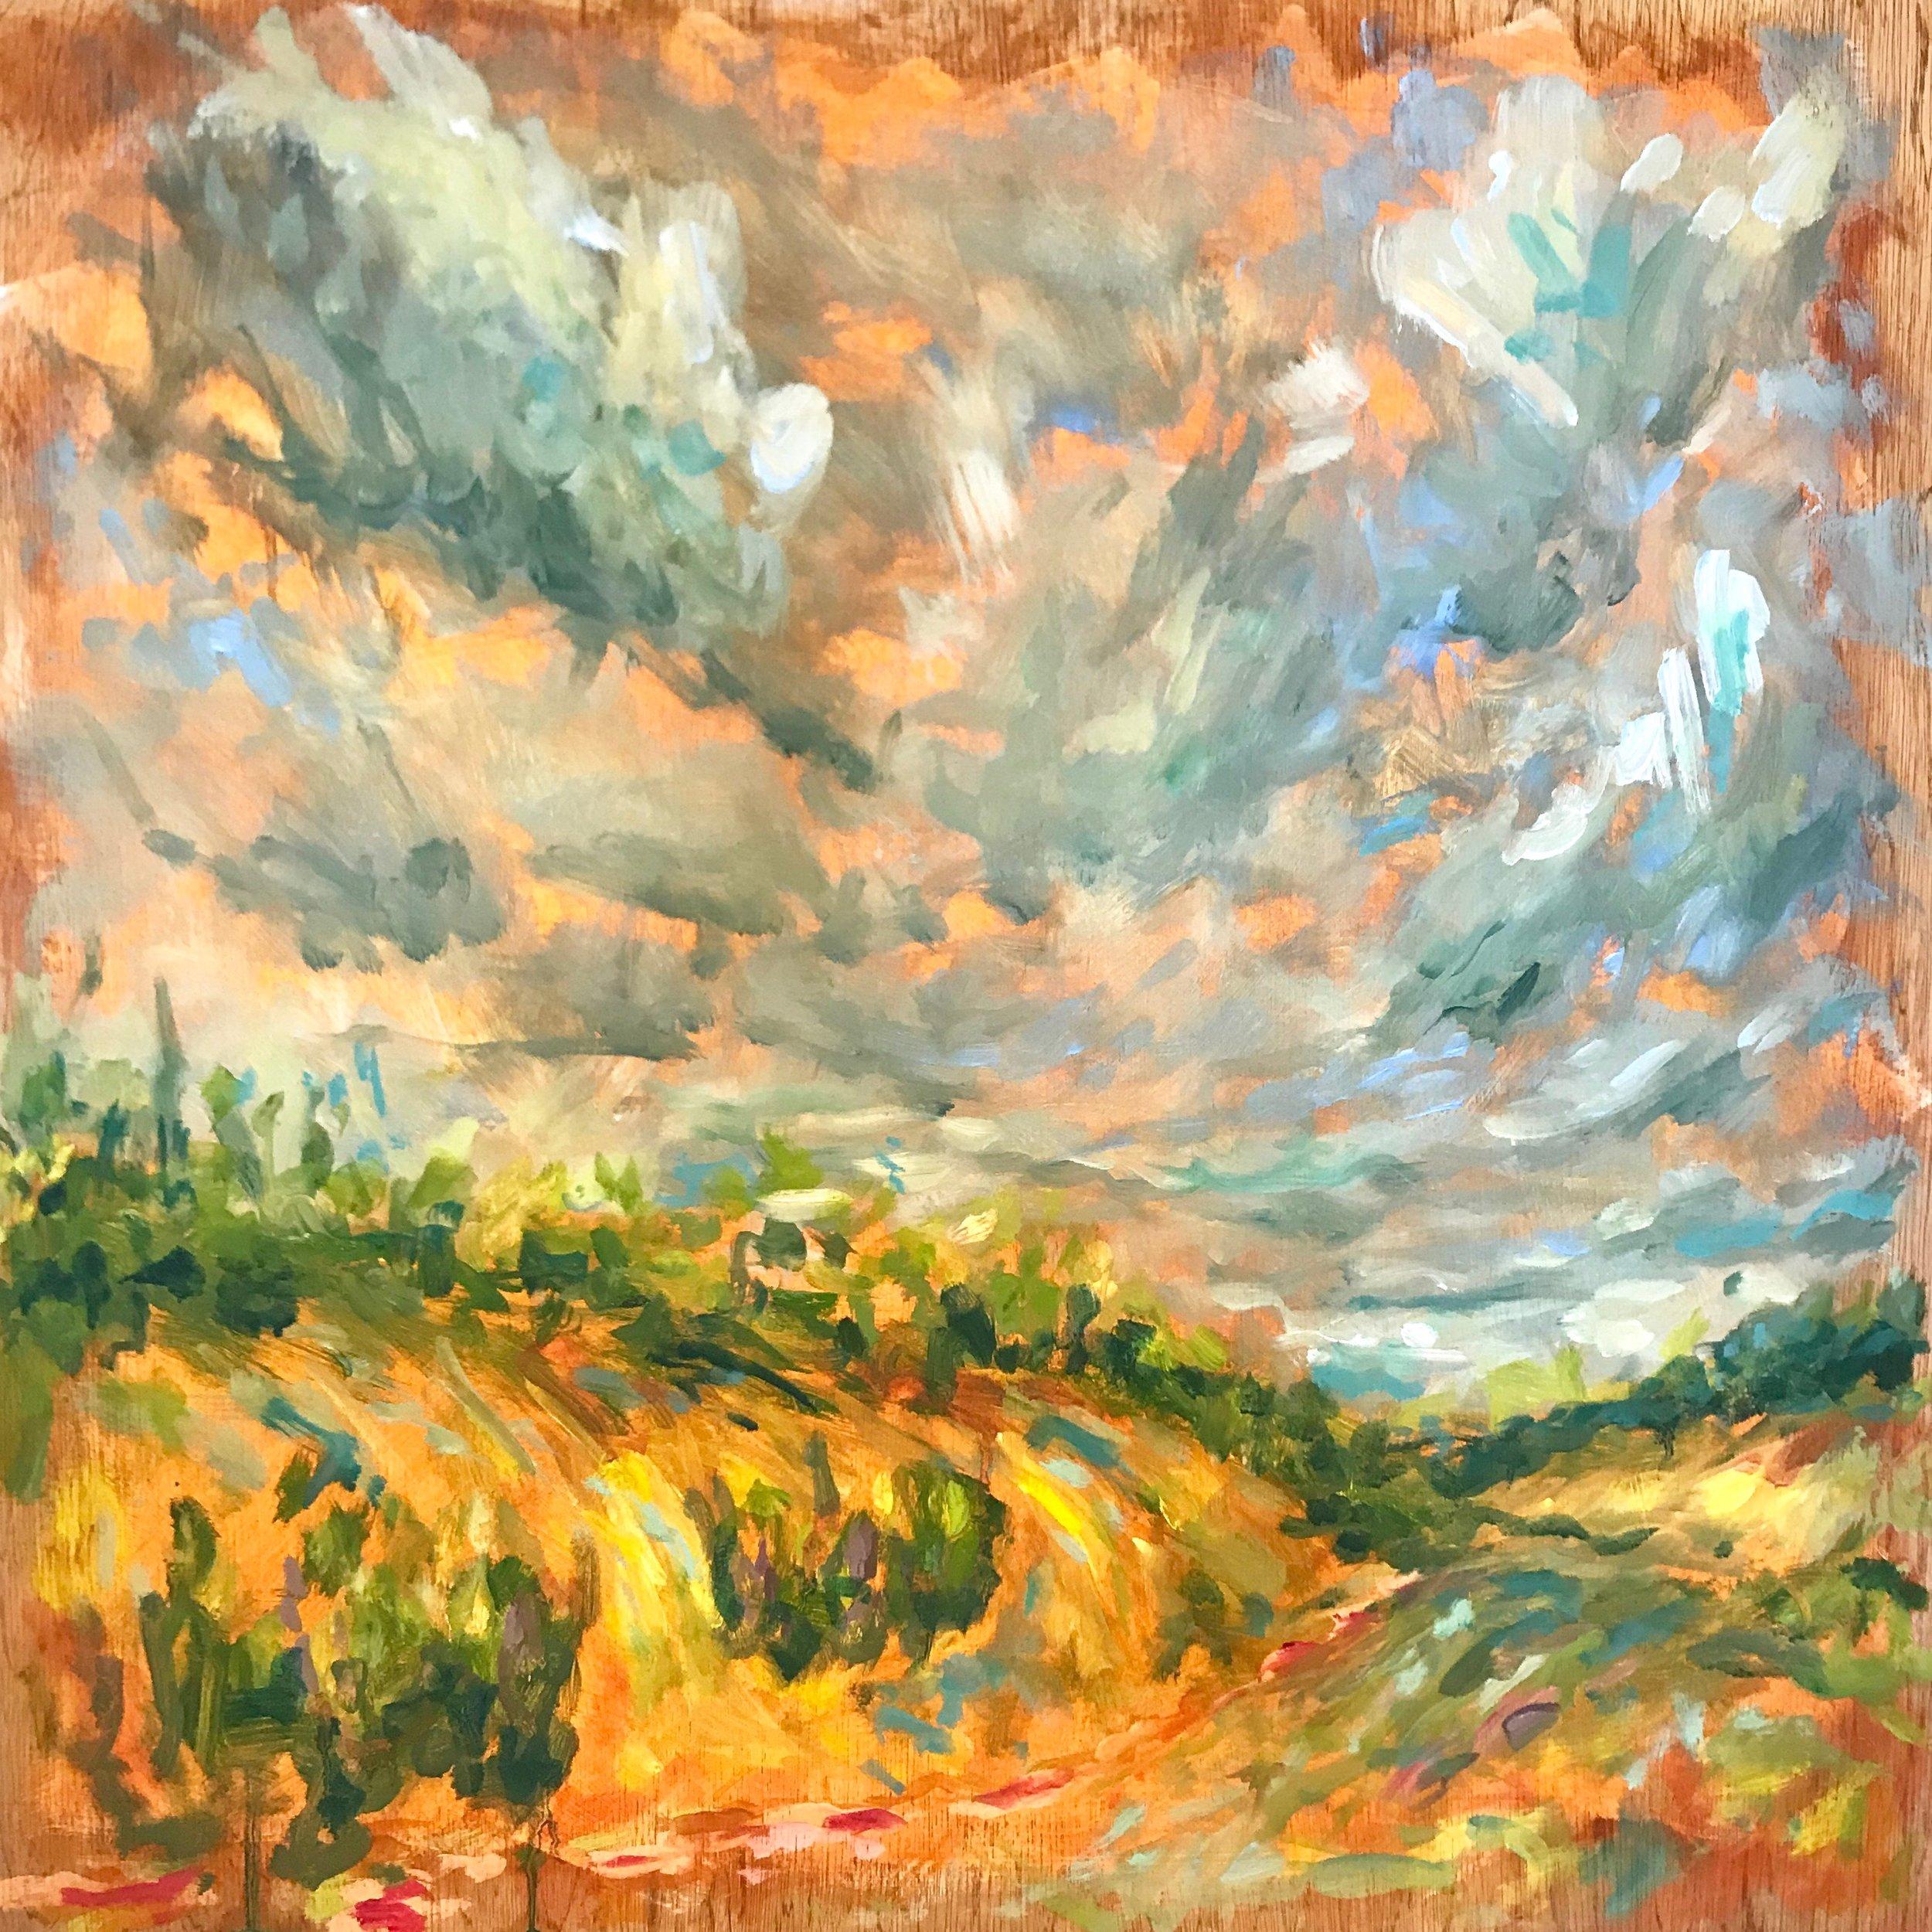 Broughton Down II, 60x60cm oil on panel, framed